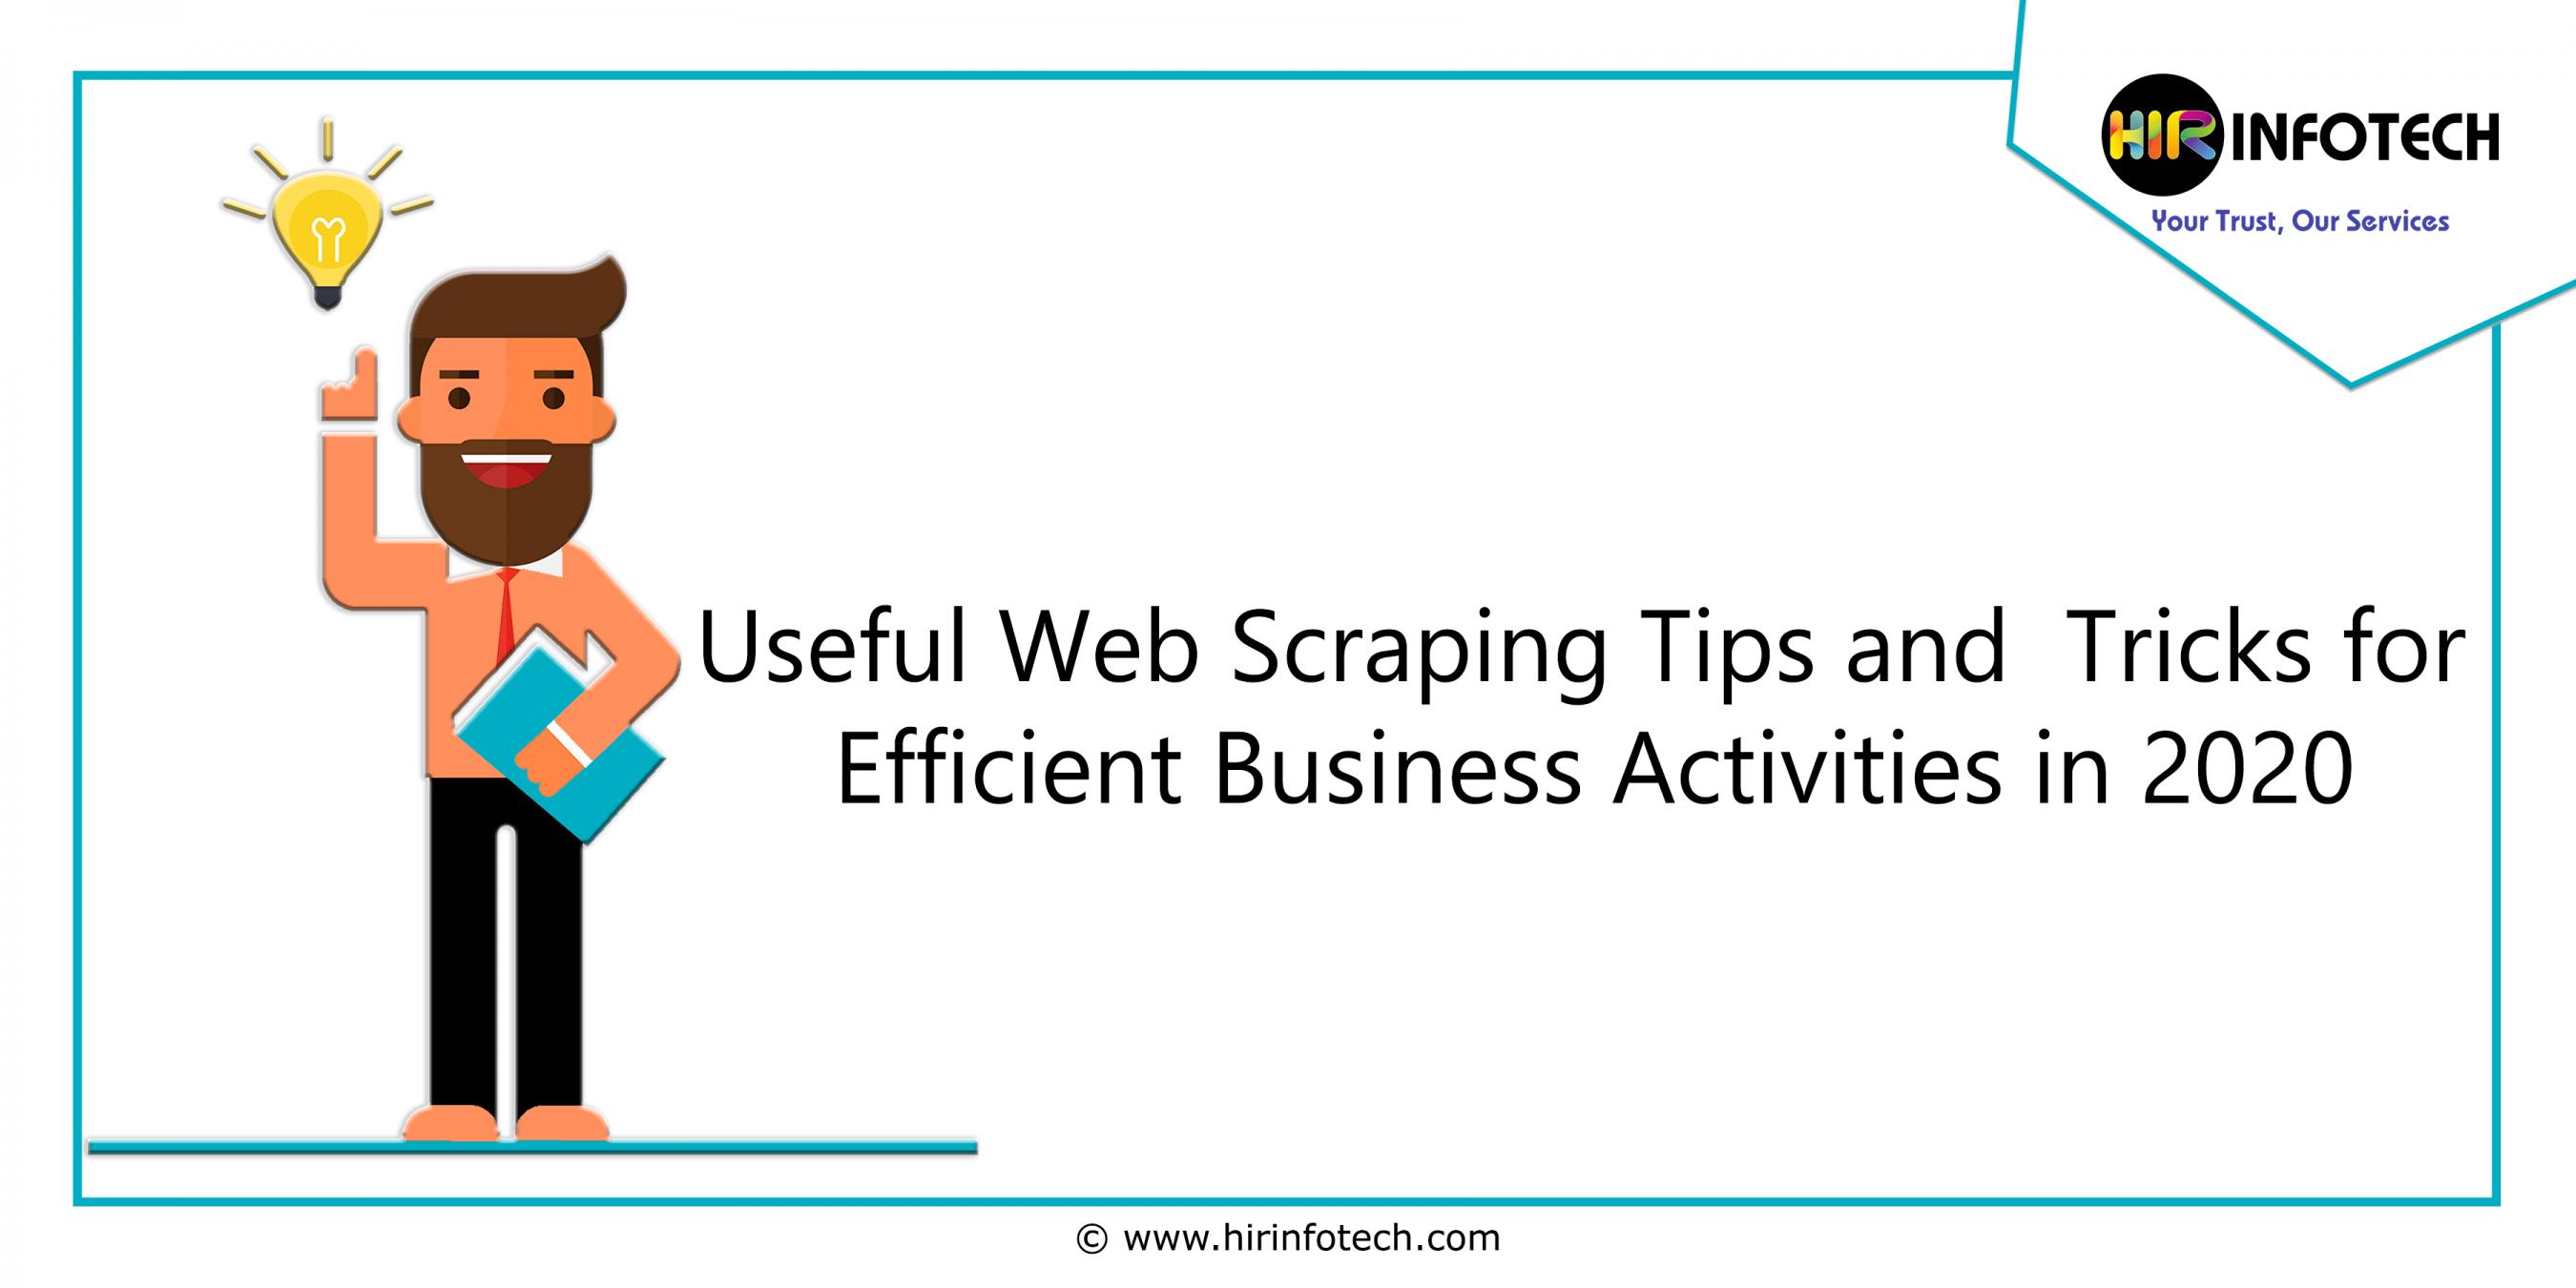 #Webscraping #Tips #businessgrowth #enterpreneurship #newbusinessopportunities #DataCrawling #Crawler #France #NewBlog #Blogger #USA #UAE